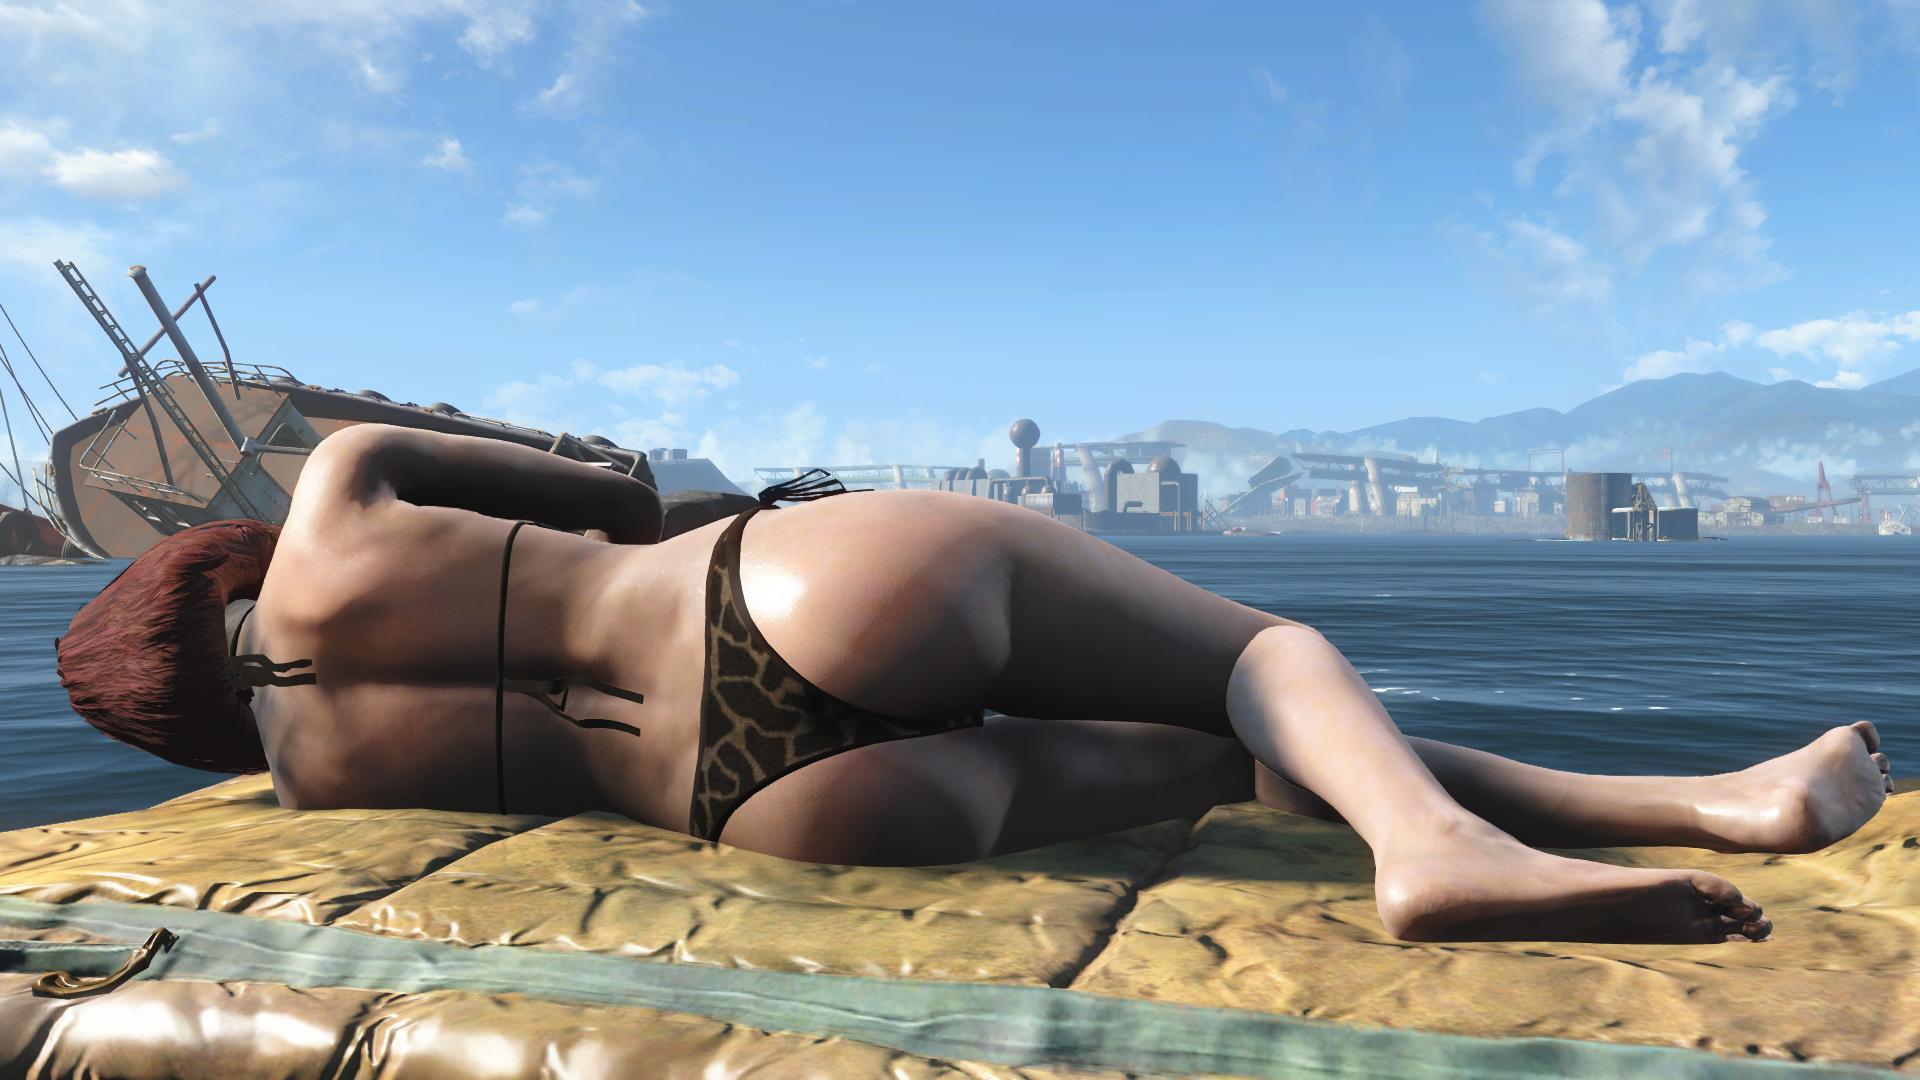 Fallout4 2016-06-09 15-35-08-16.jpg